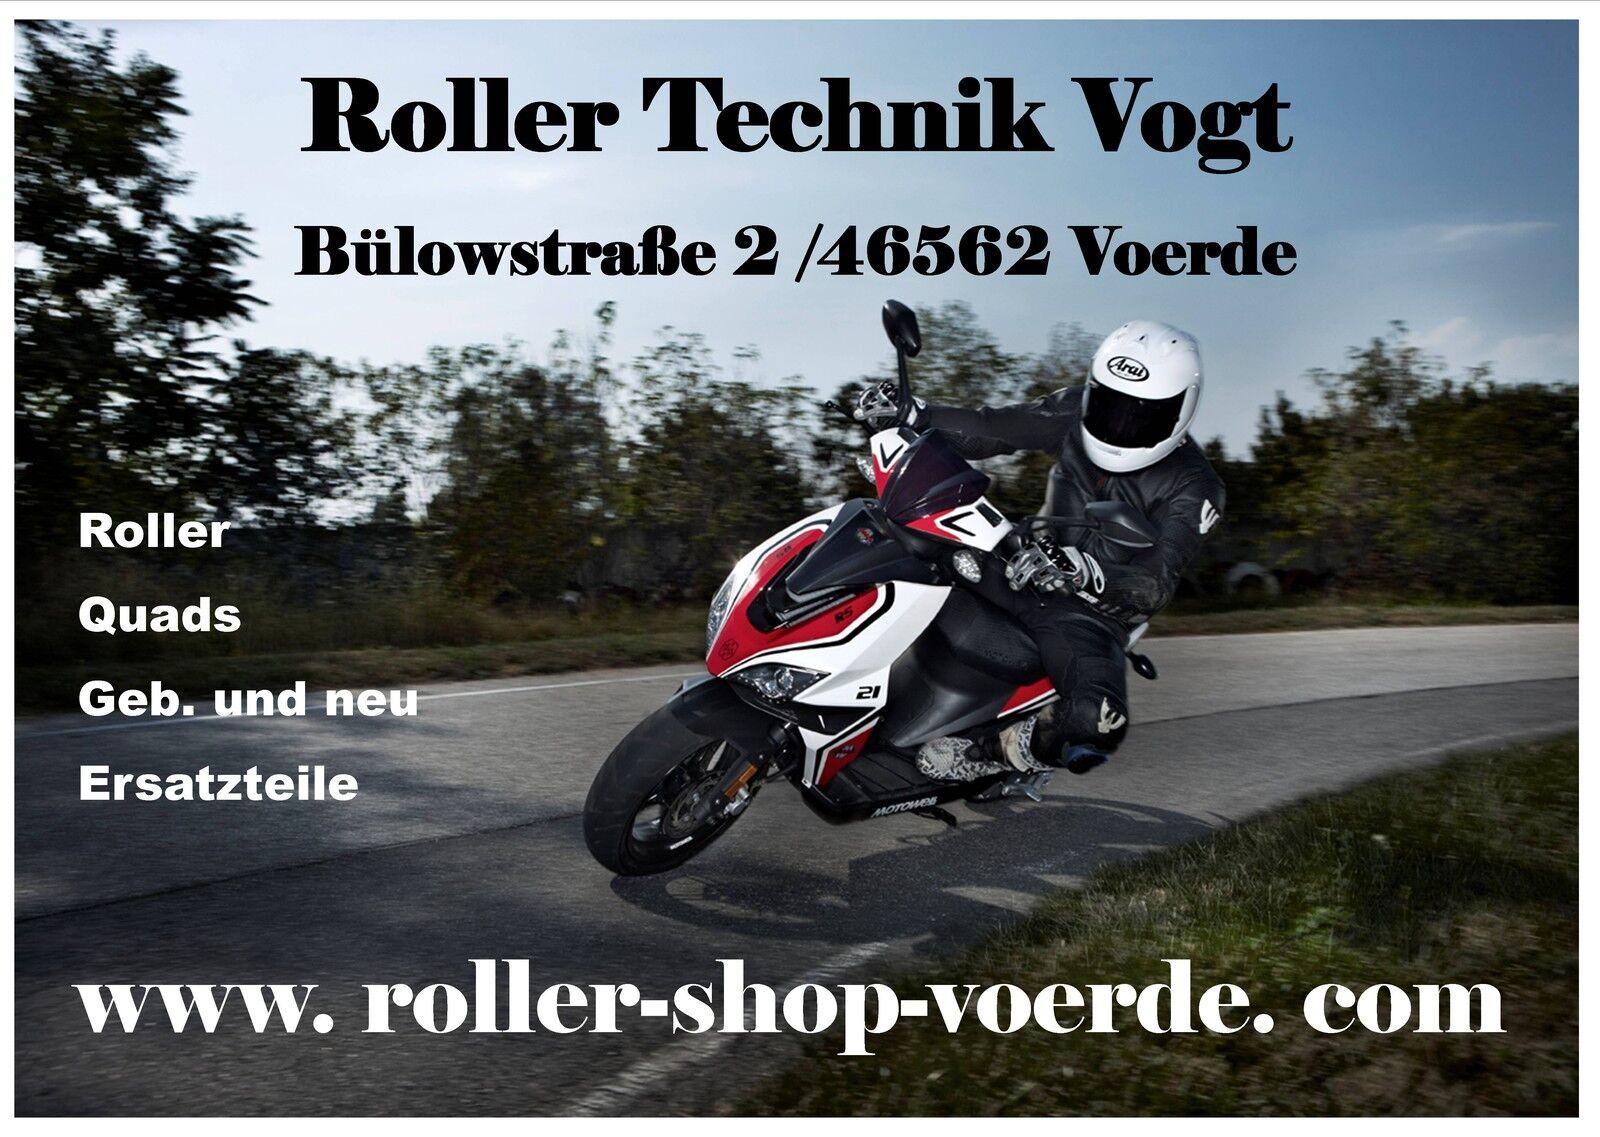 roller-technik-vogt